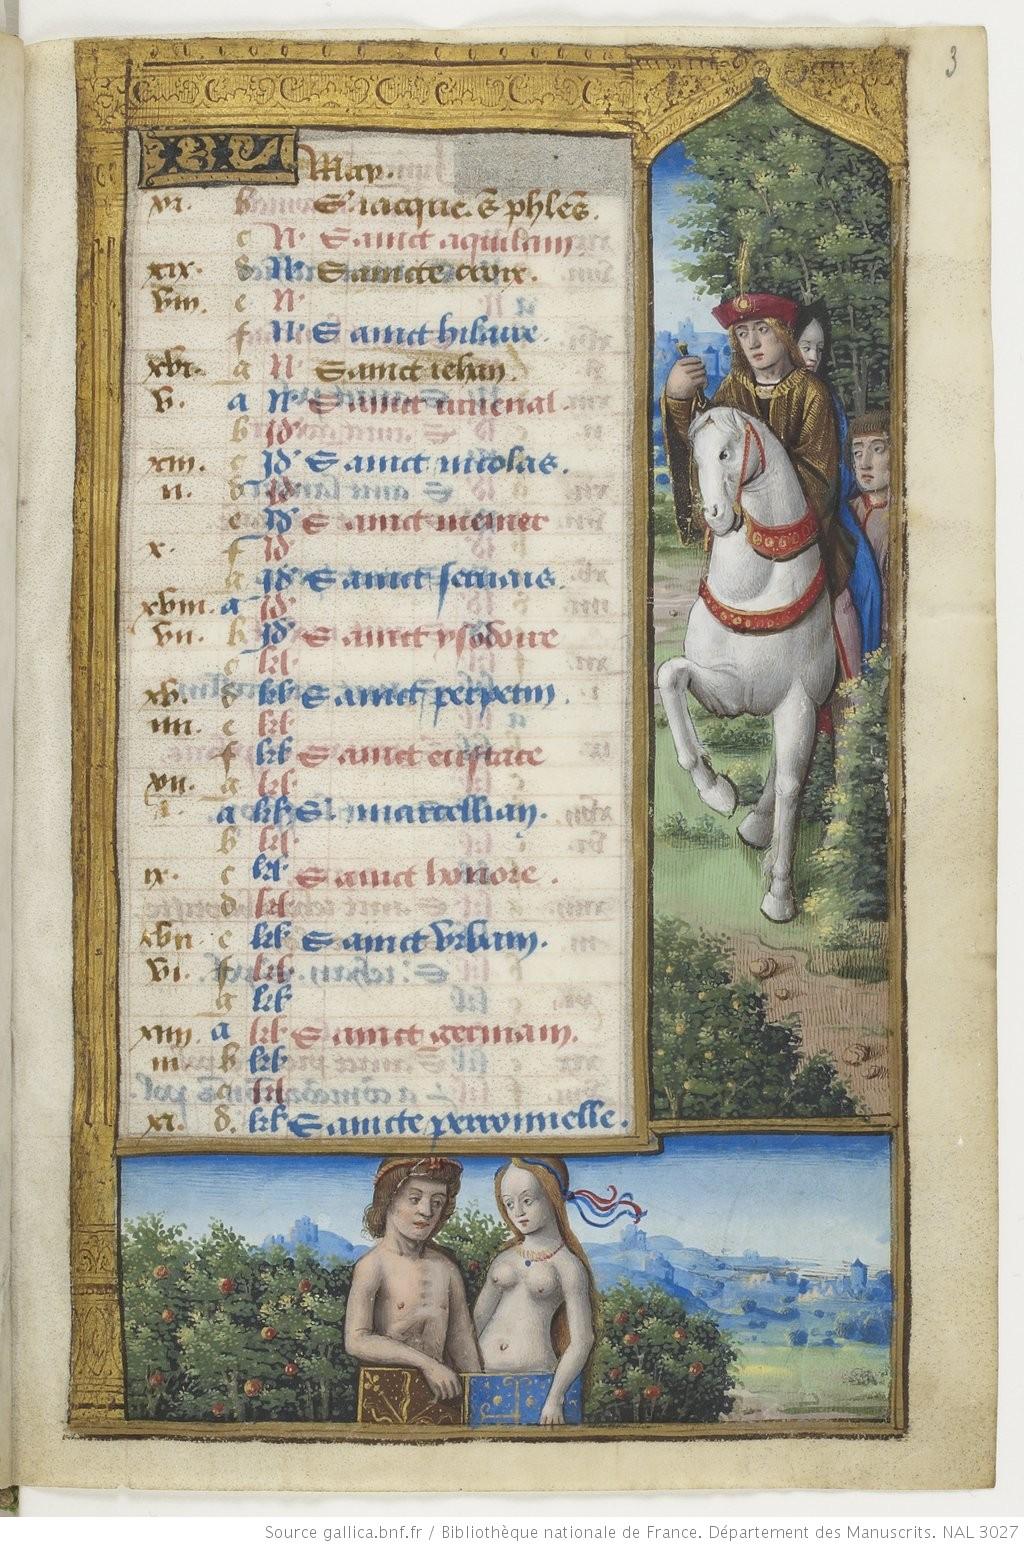 Maitre des Triomphes de Petrarque Petites Heures d'Anne de Bretagne BNF NAL 3027 fol 3r Mai Gallica